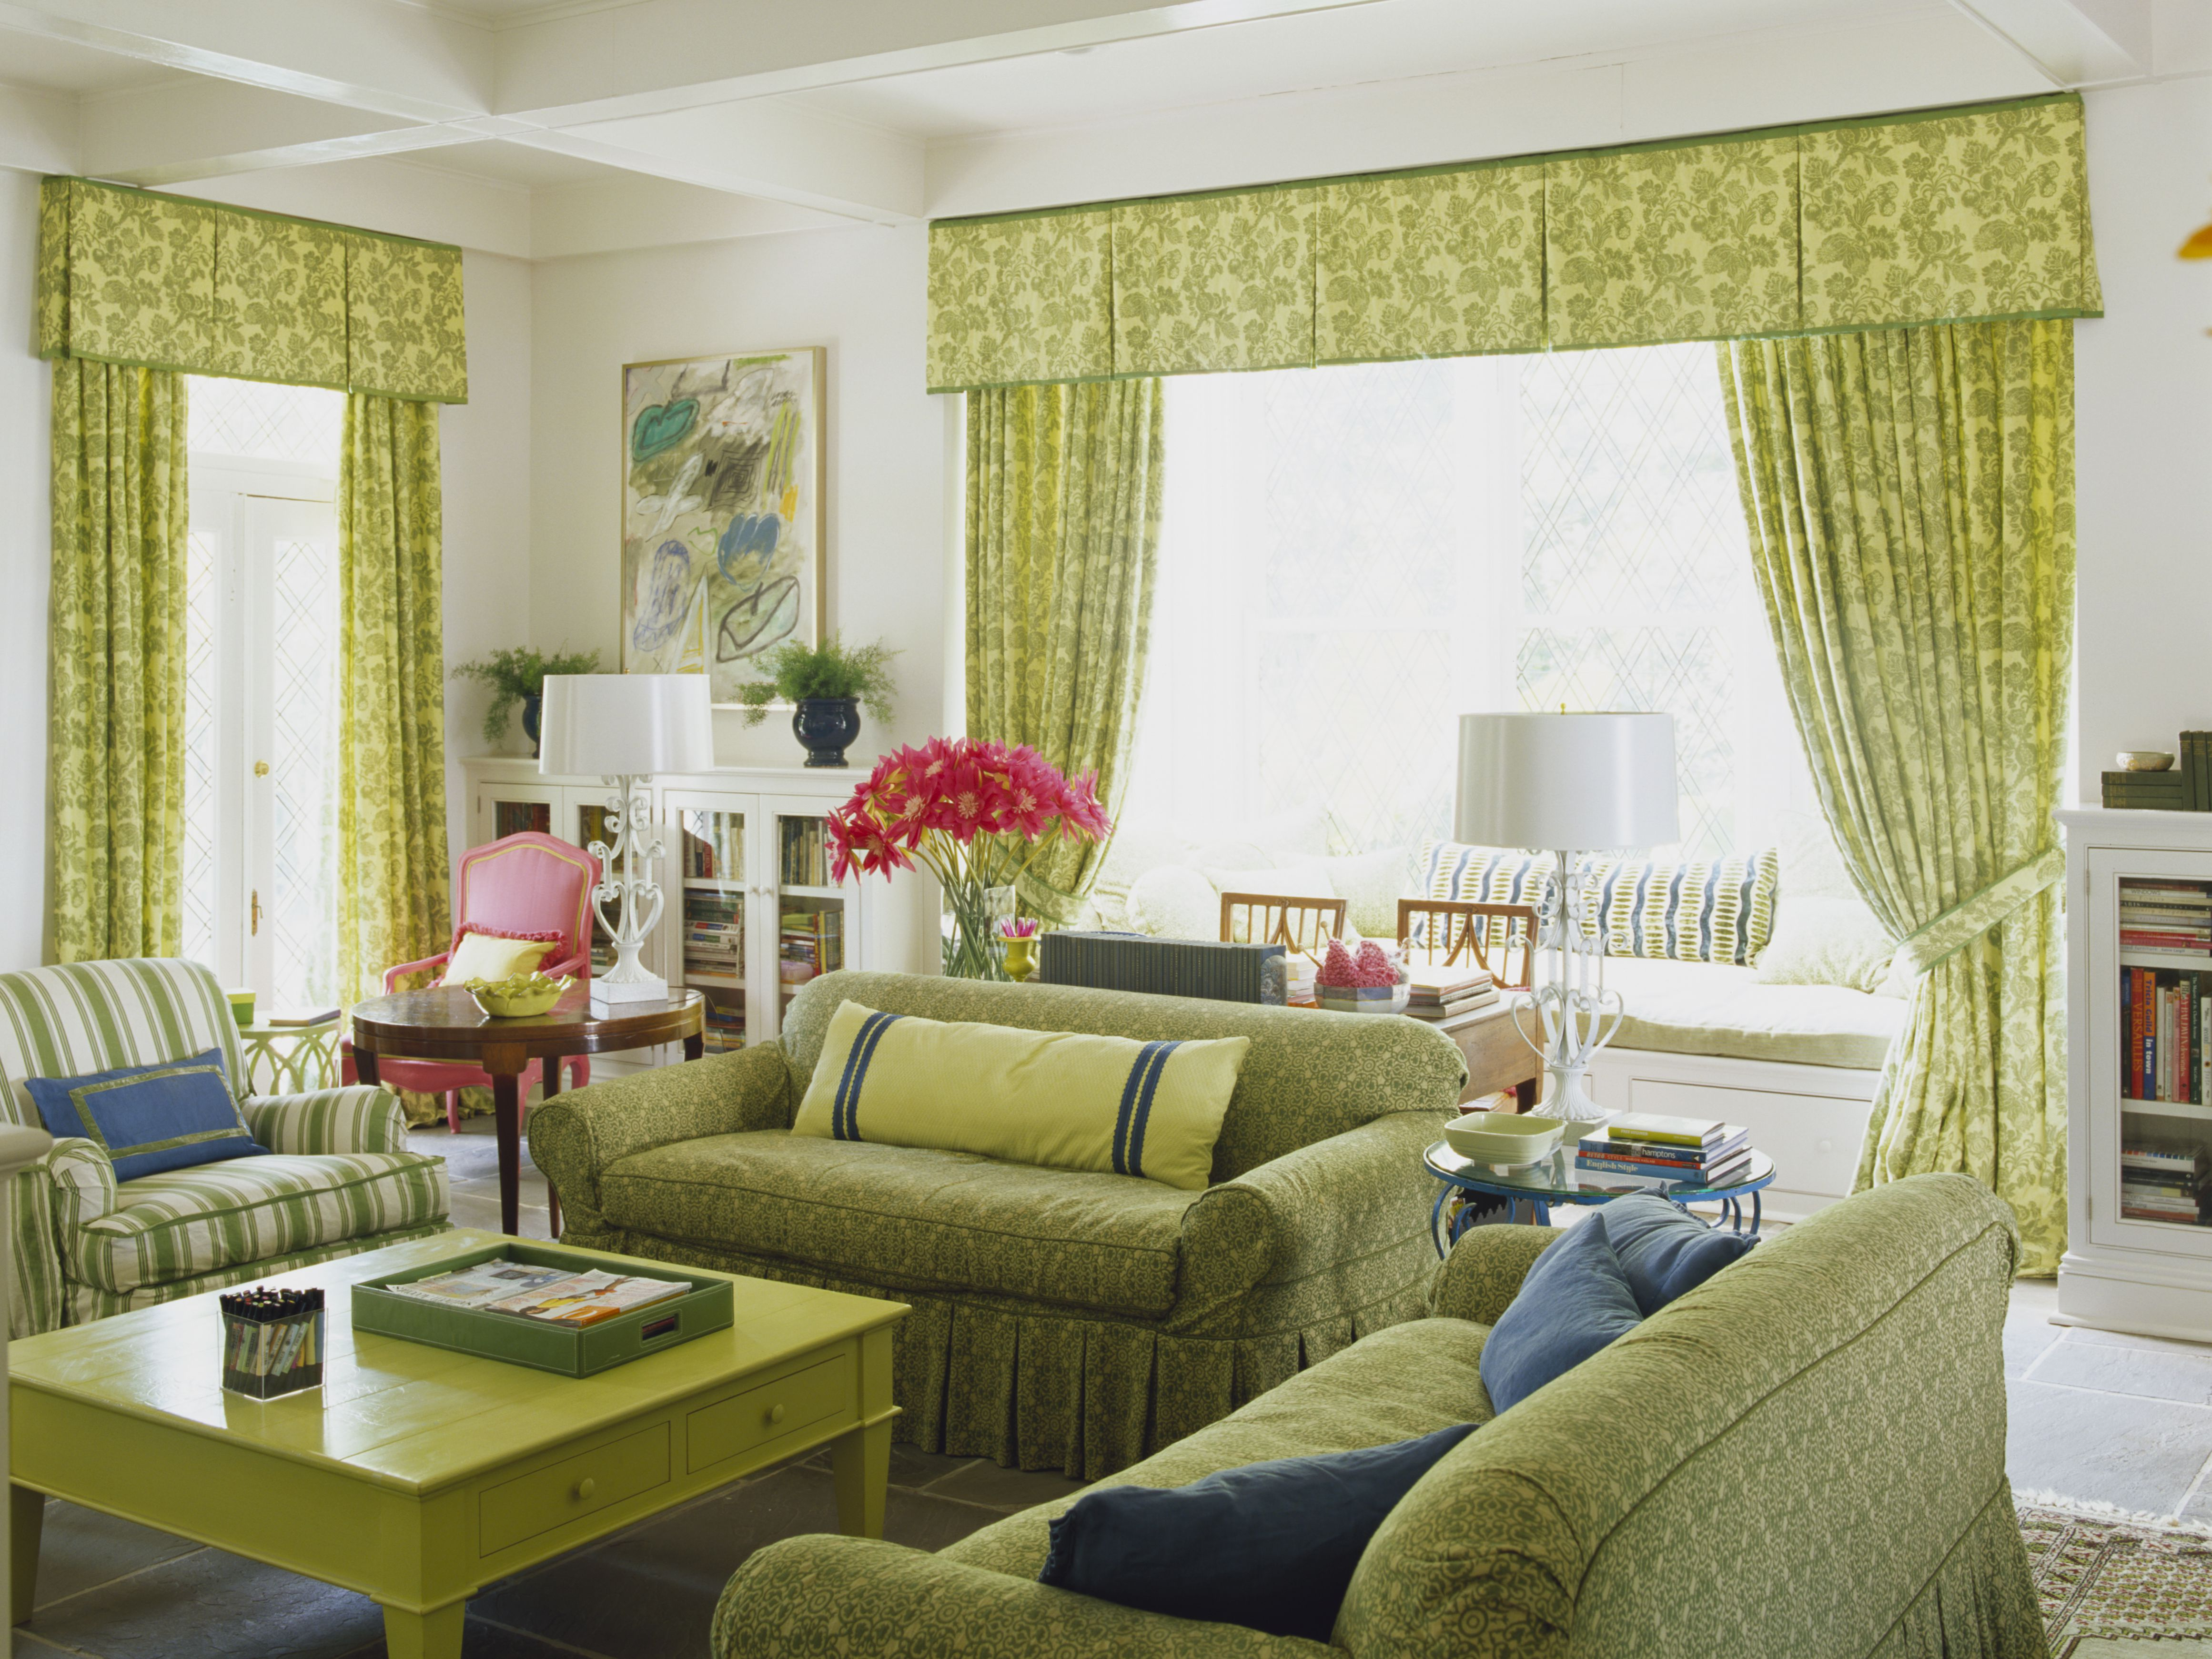 How To Make A Diy Window Valance